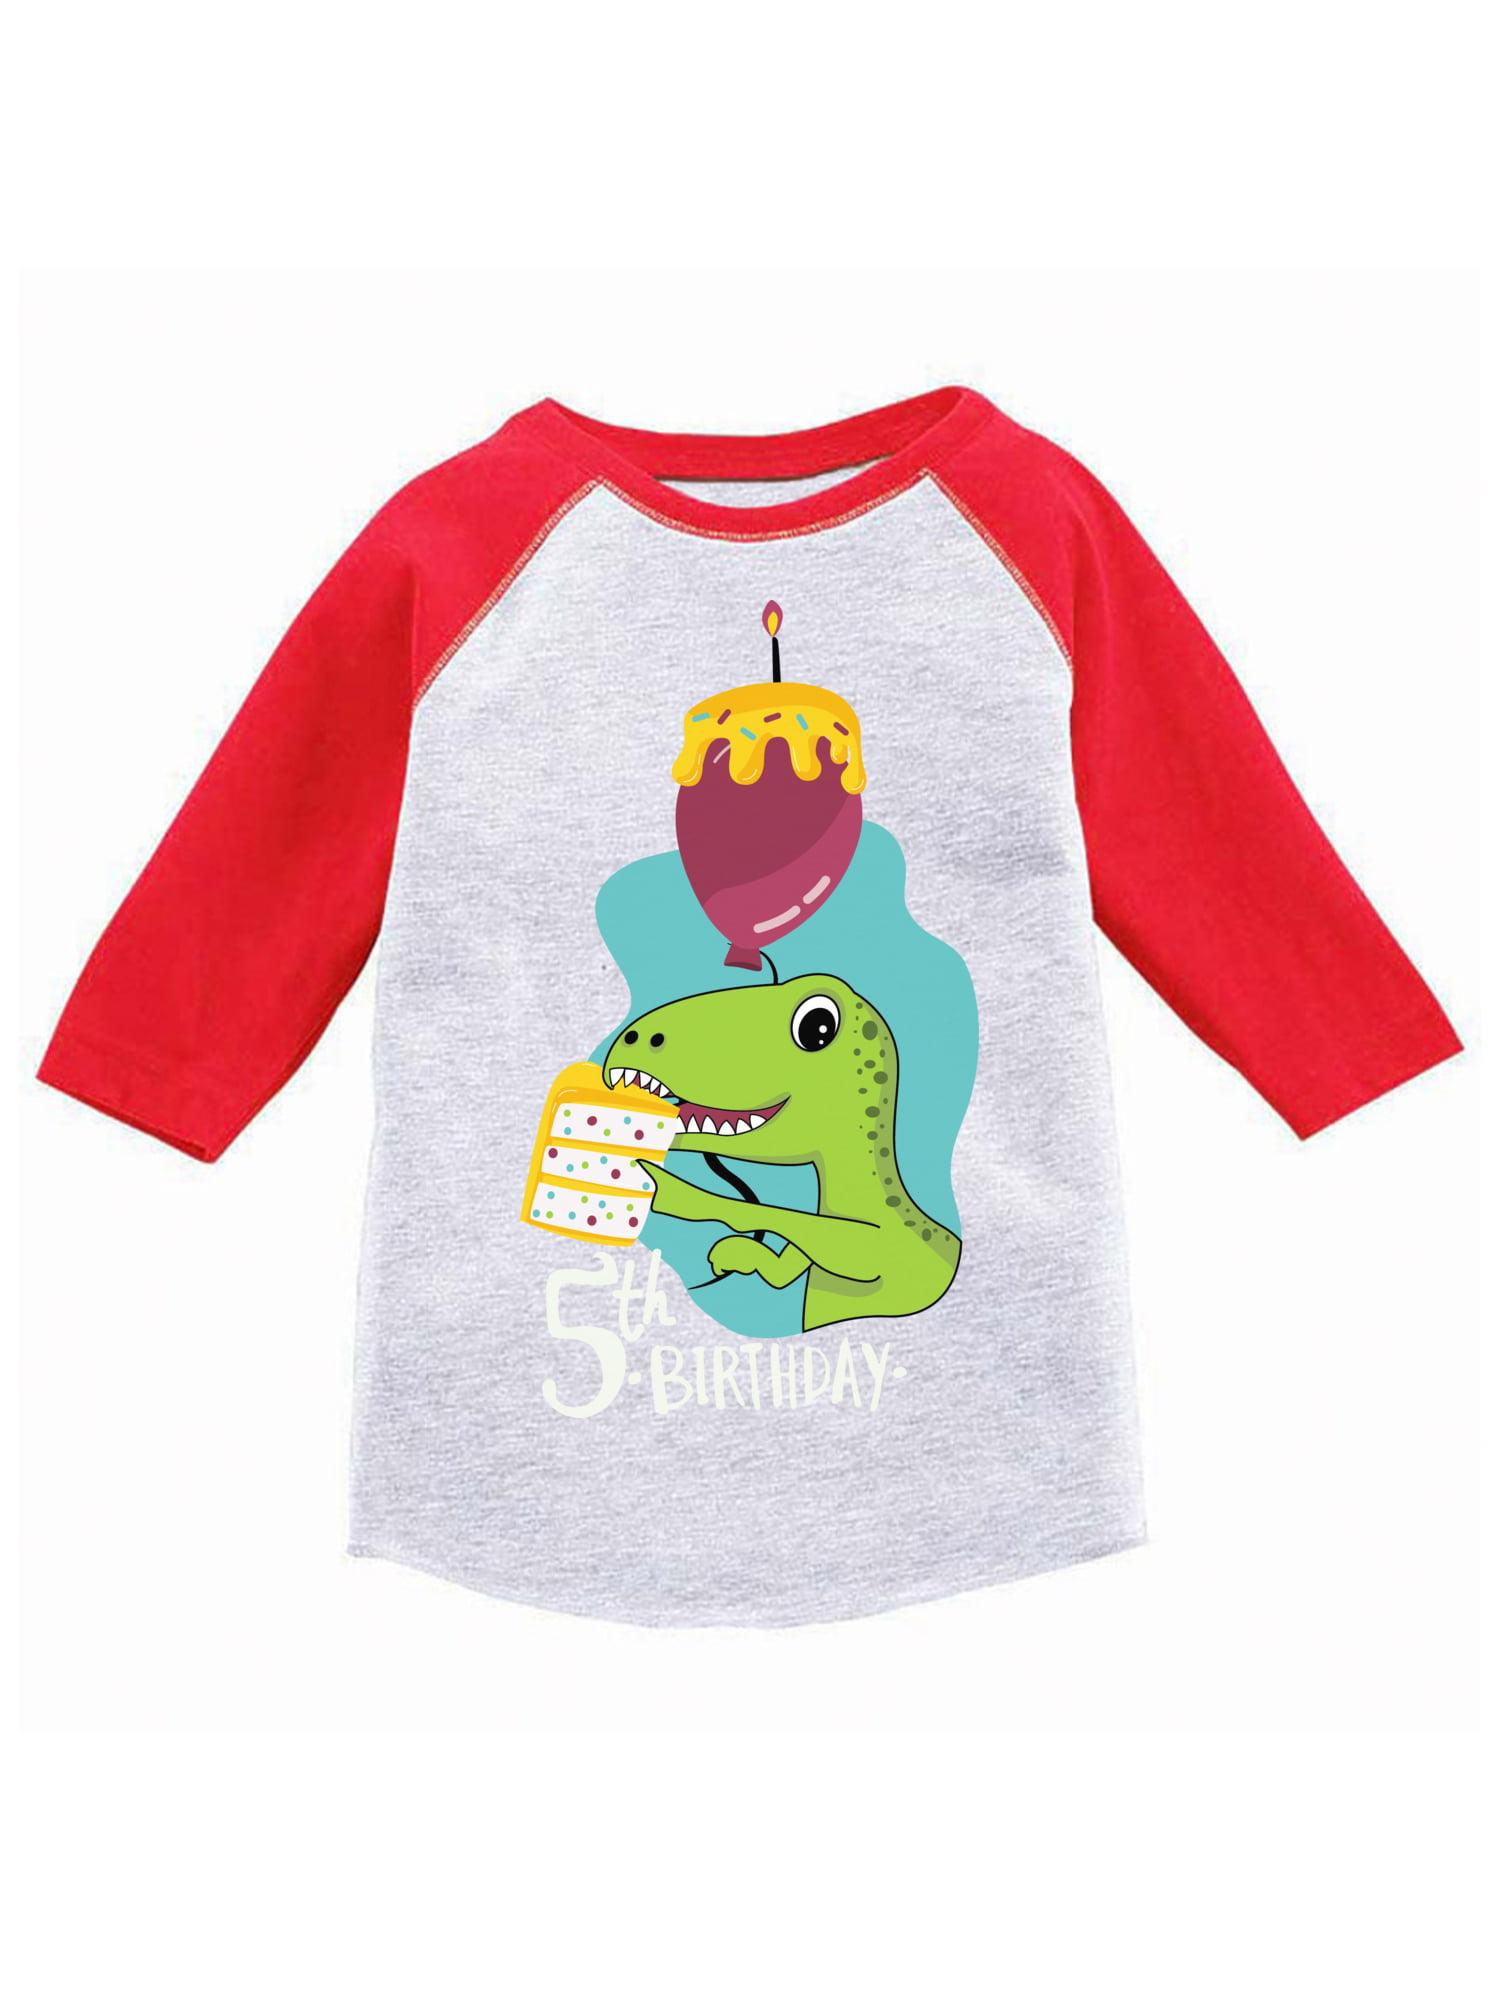 Awkward Styles Dinosaur Birthday Toddler Raglan 5th Party Shirt Gifts For Kids Themed Boy Jersey